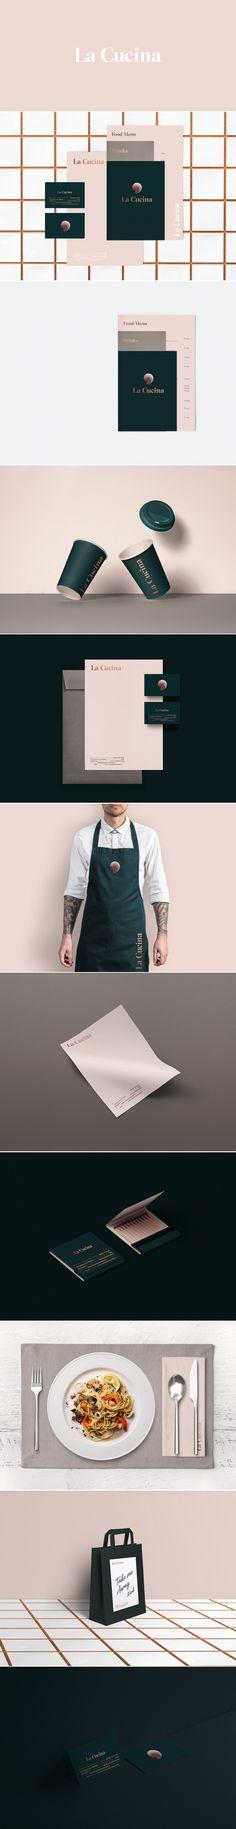 Super Ideas For Jewerly Branding Identity Galleries Brand Identity Design, Design Agency, Branding Design, Branding Agency, Corporate Branding, Corporate Design, Brand Packaging, Packaging Design, Restaurant Identity